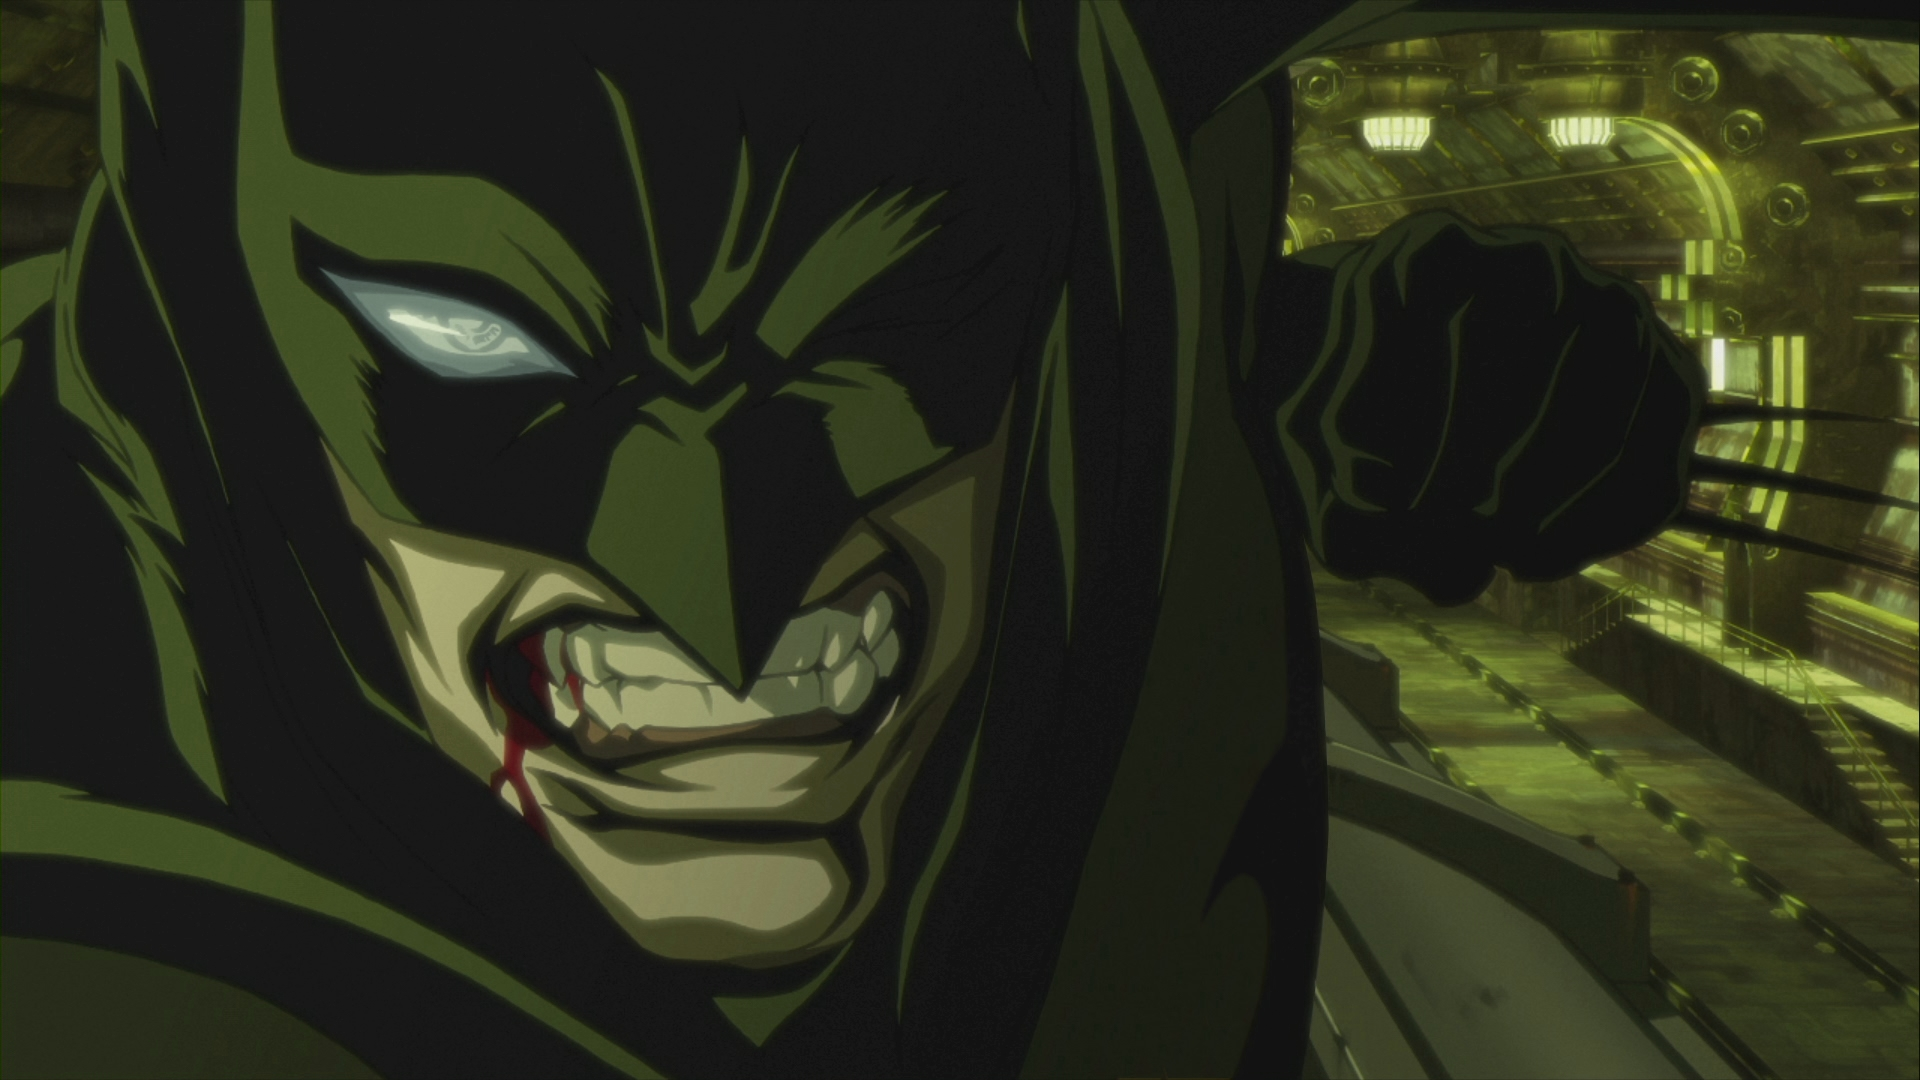 Batman Gotham Knight image